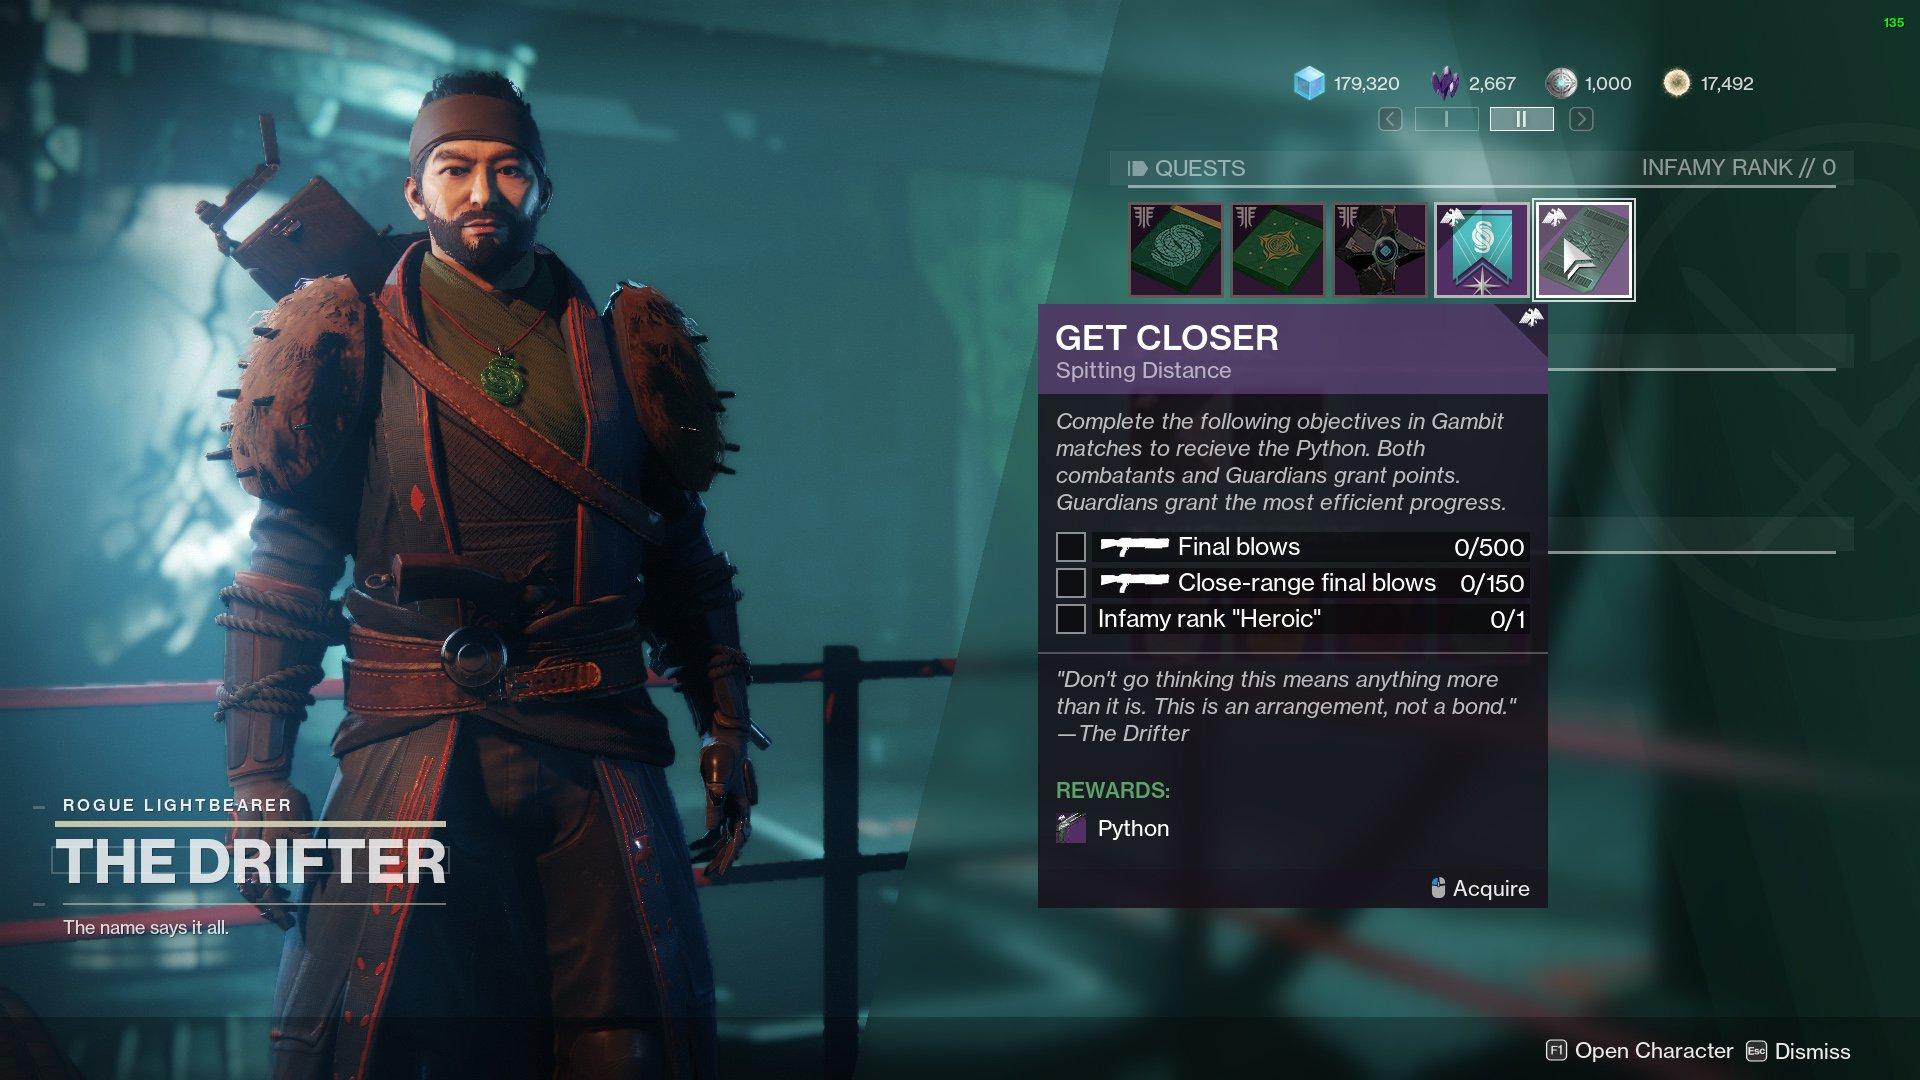 destiny 2 get closer quest